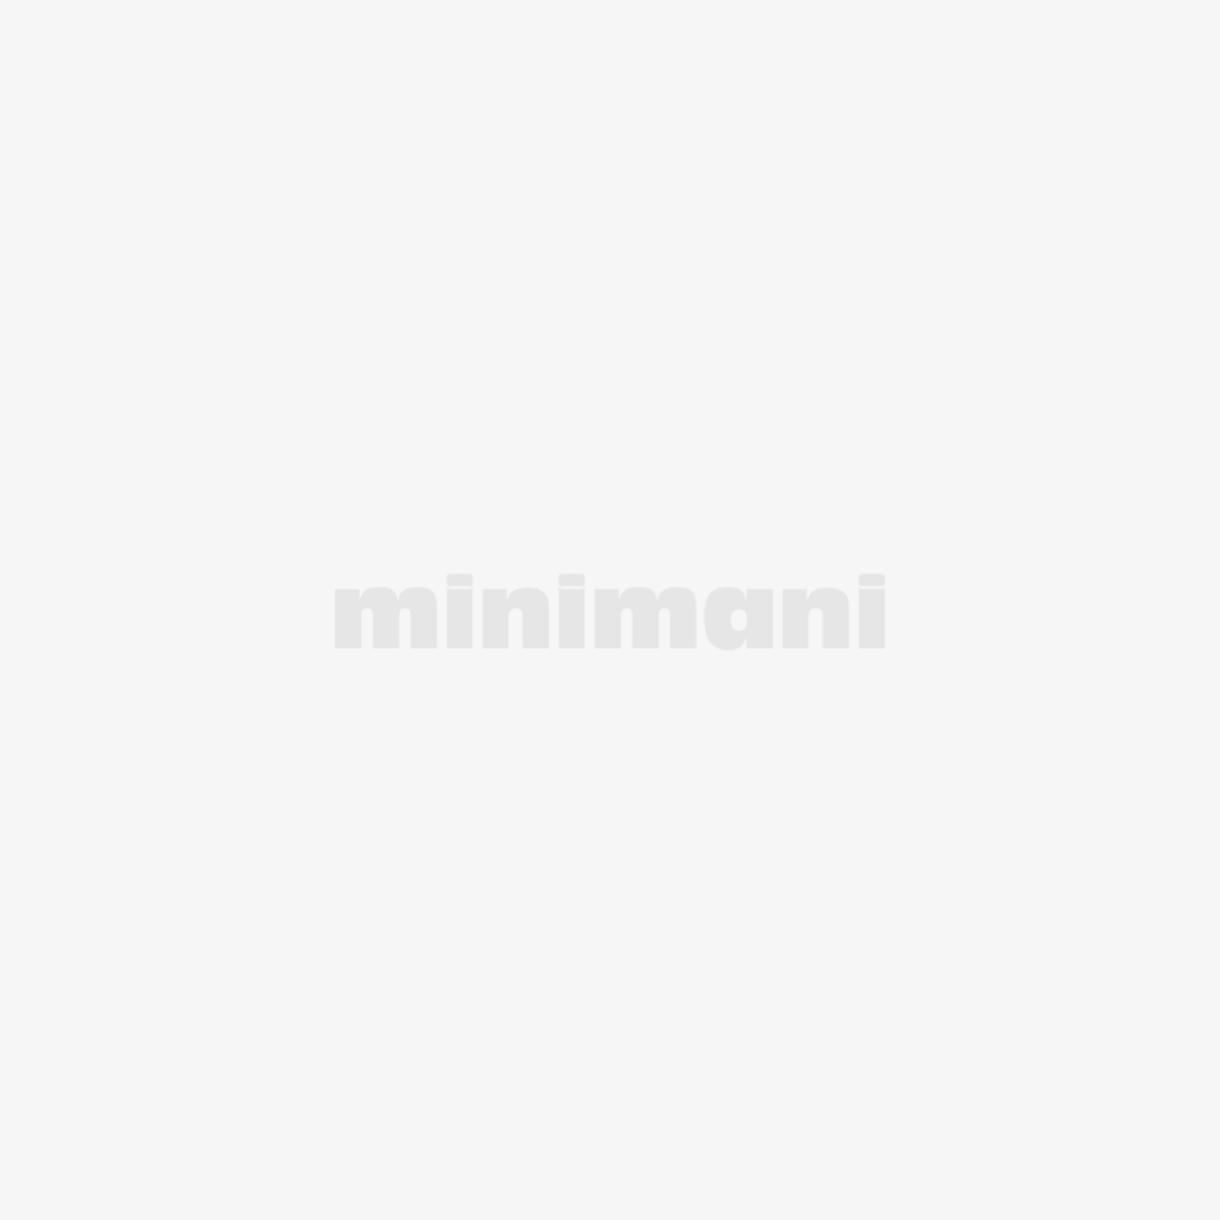 OPAL ACL469 VOIMAJATKOJOHTO VSB 5X2,5 10M 5-NAPAINEN